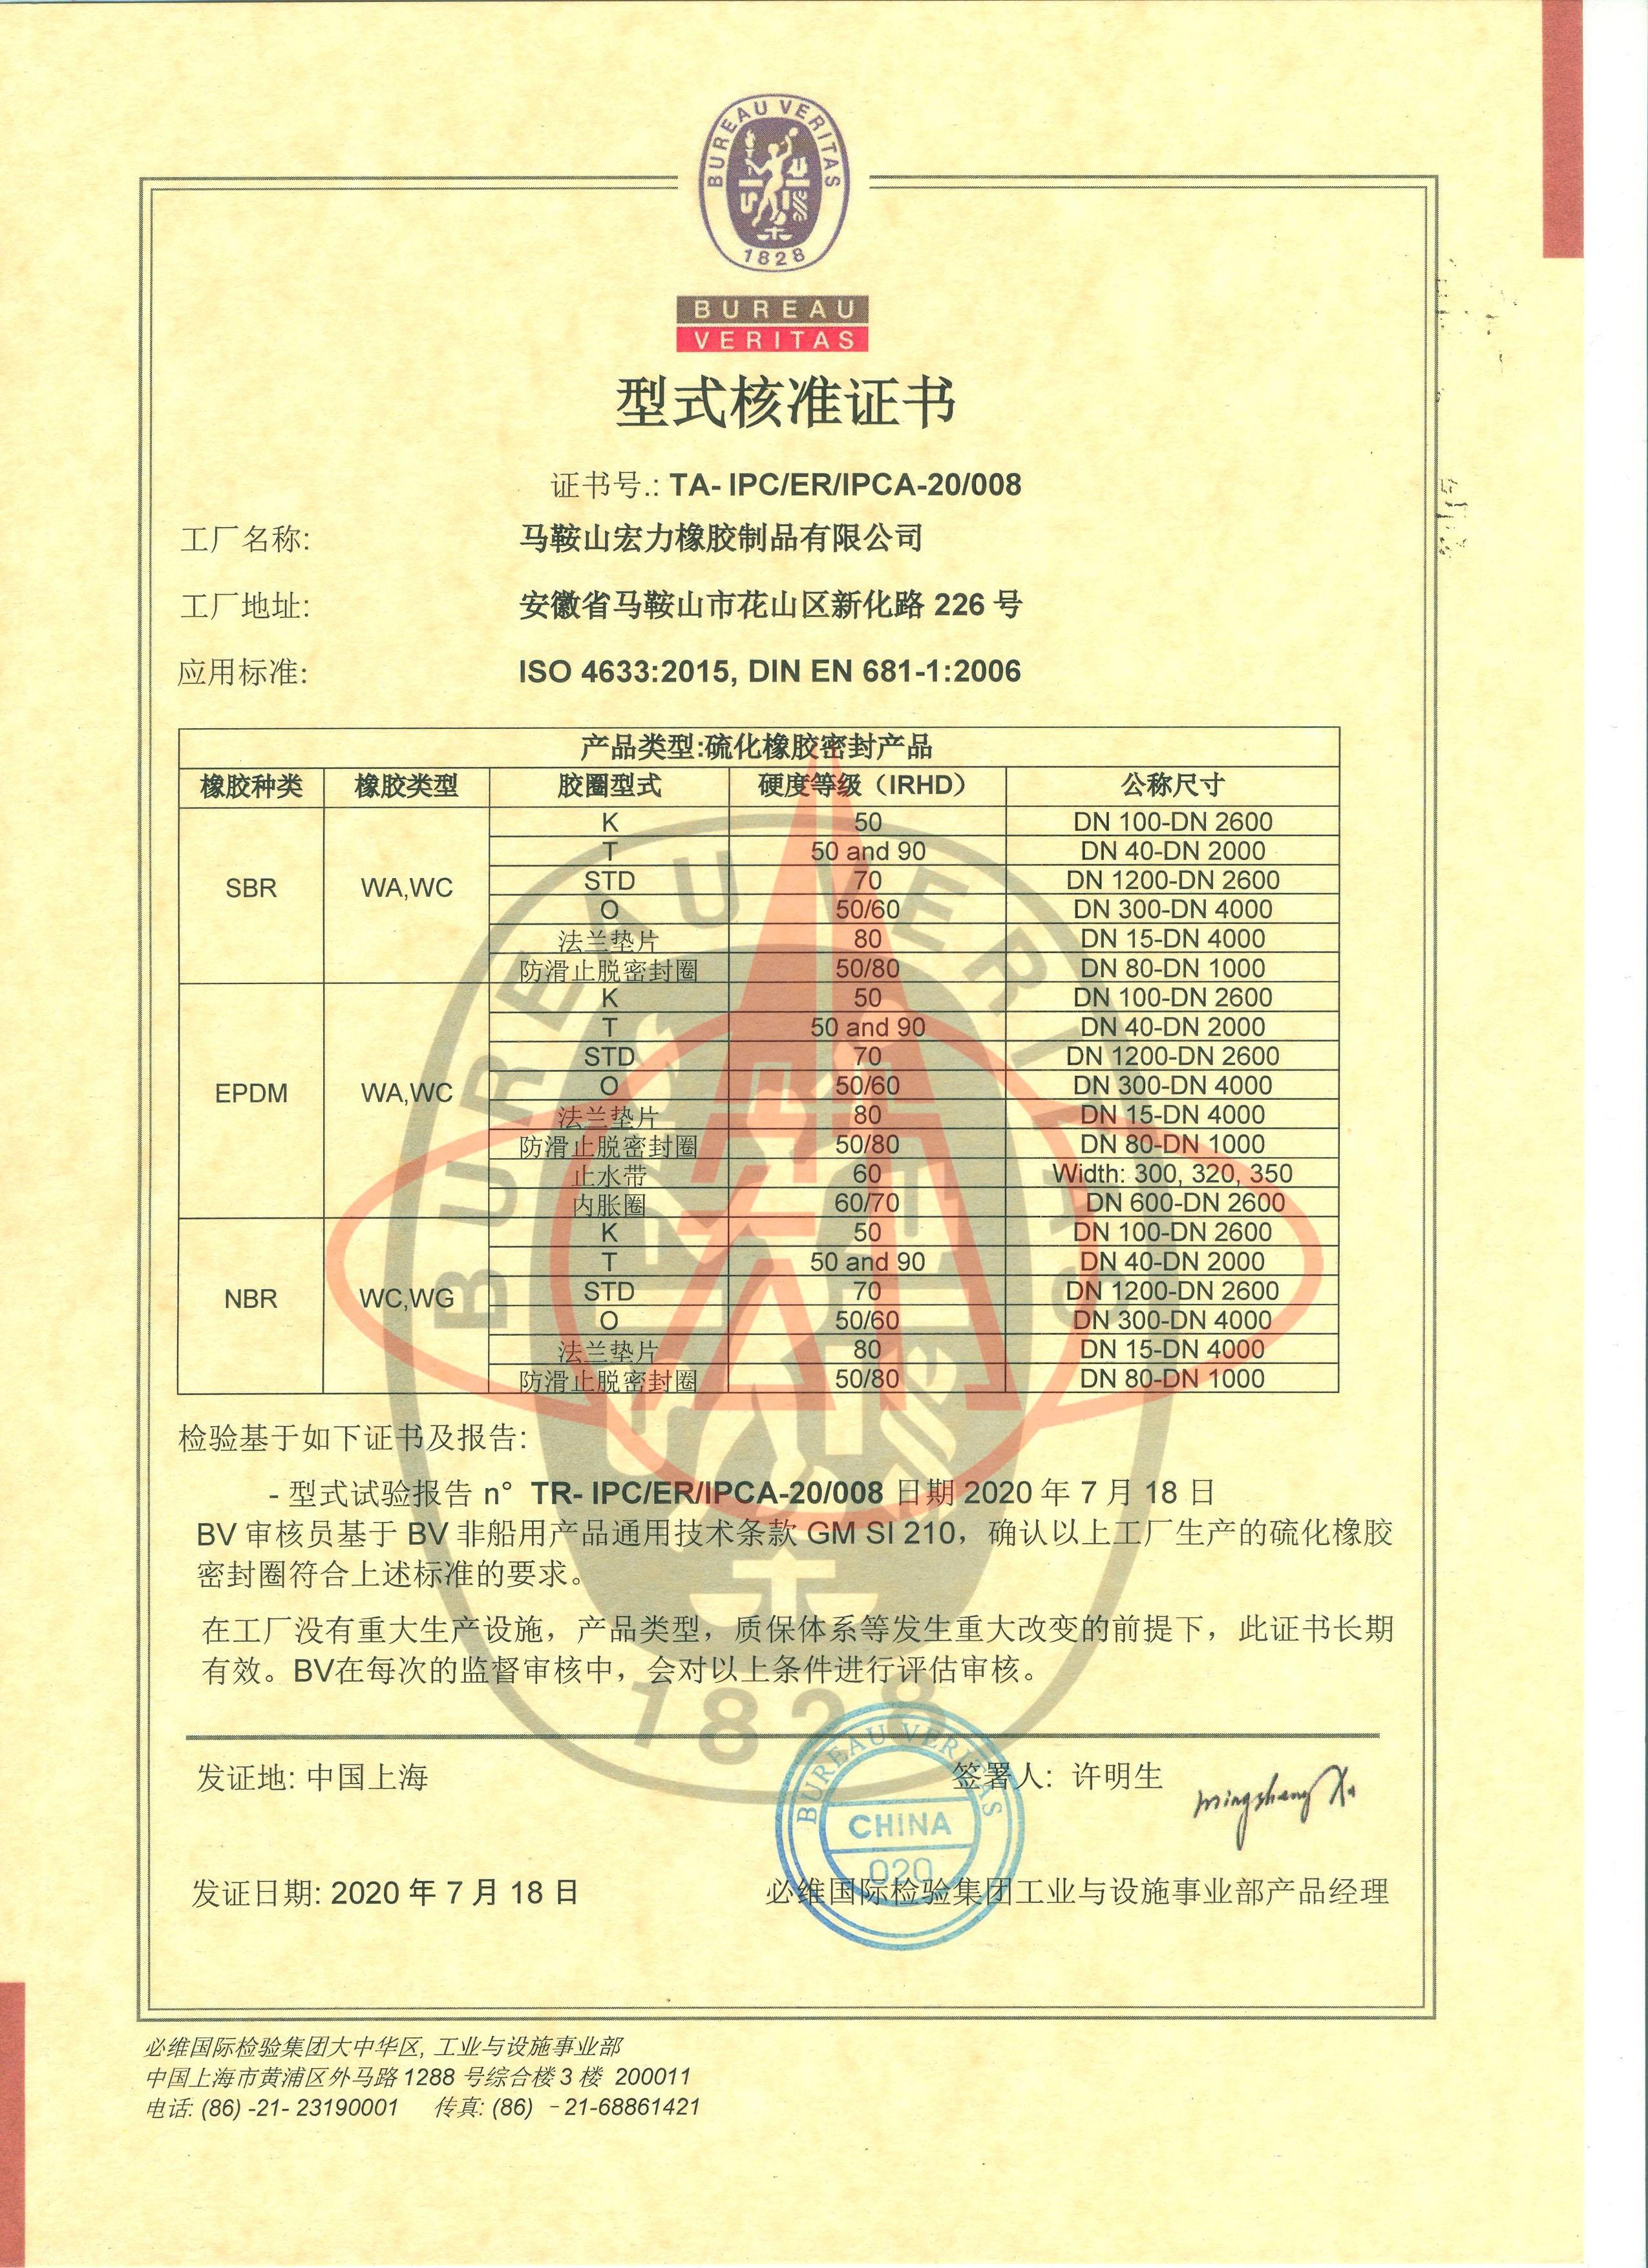 BV型式核准证书